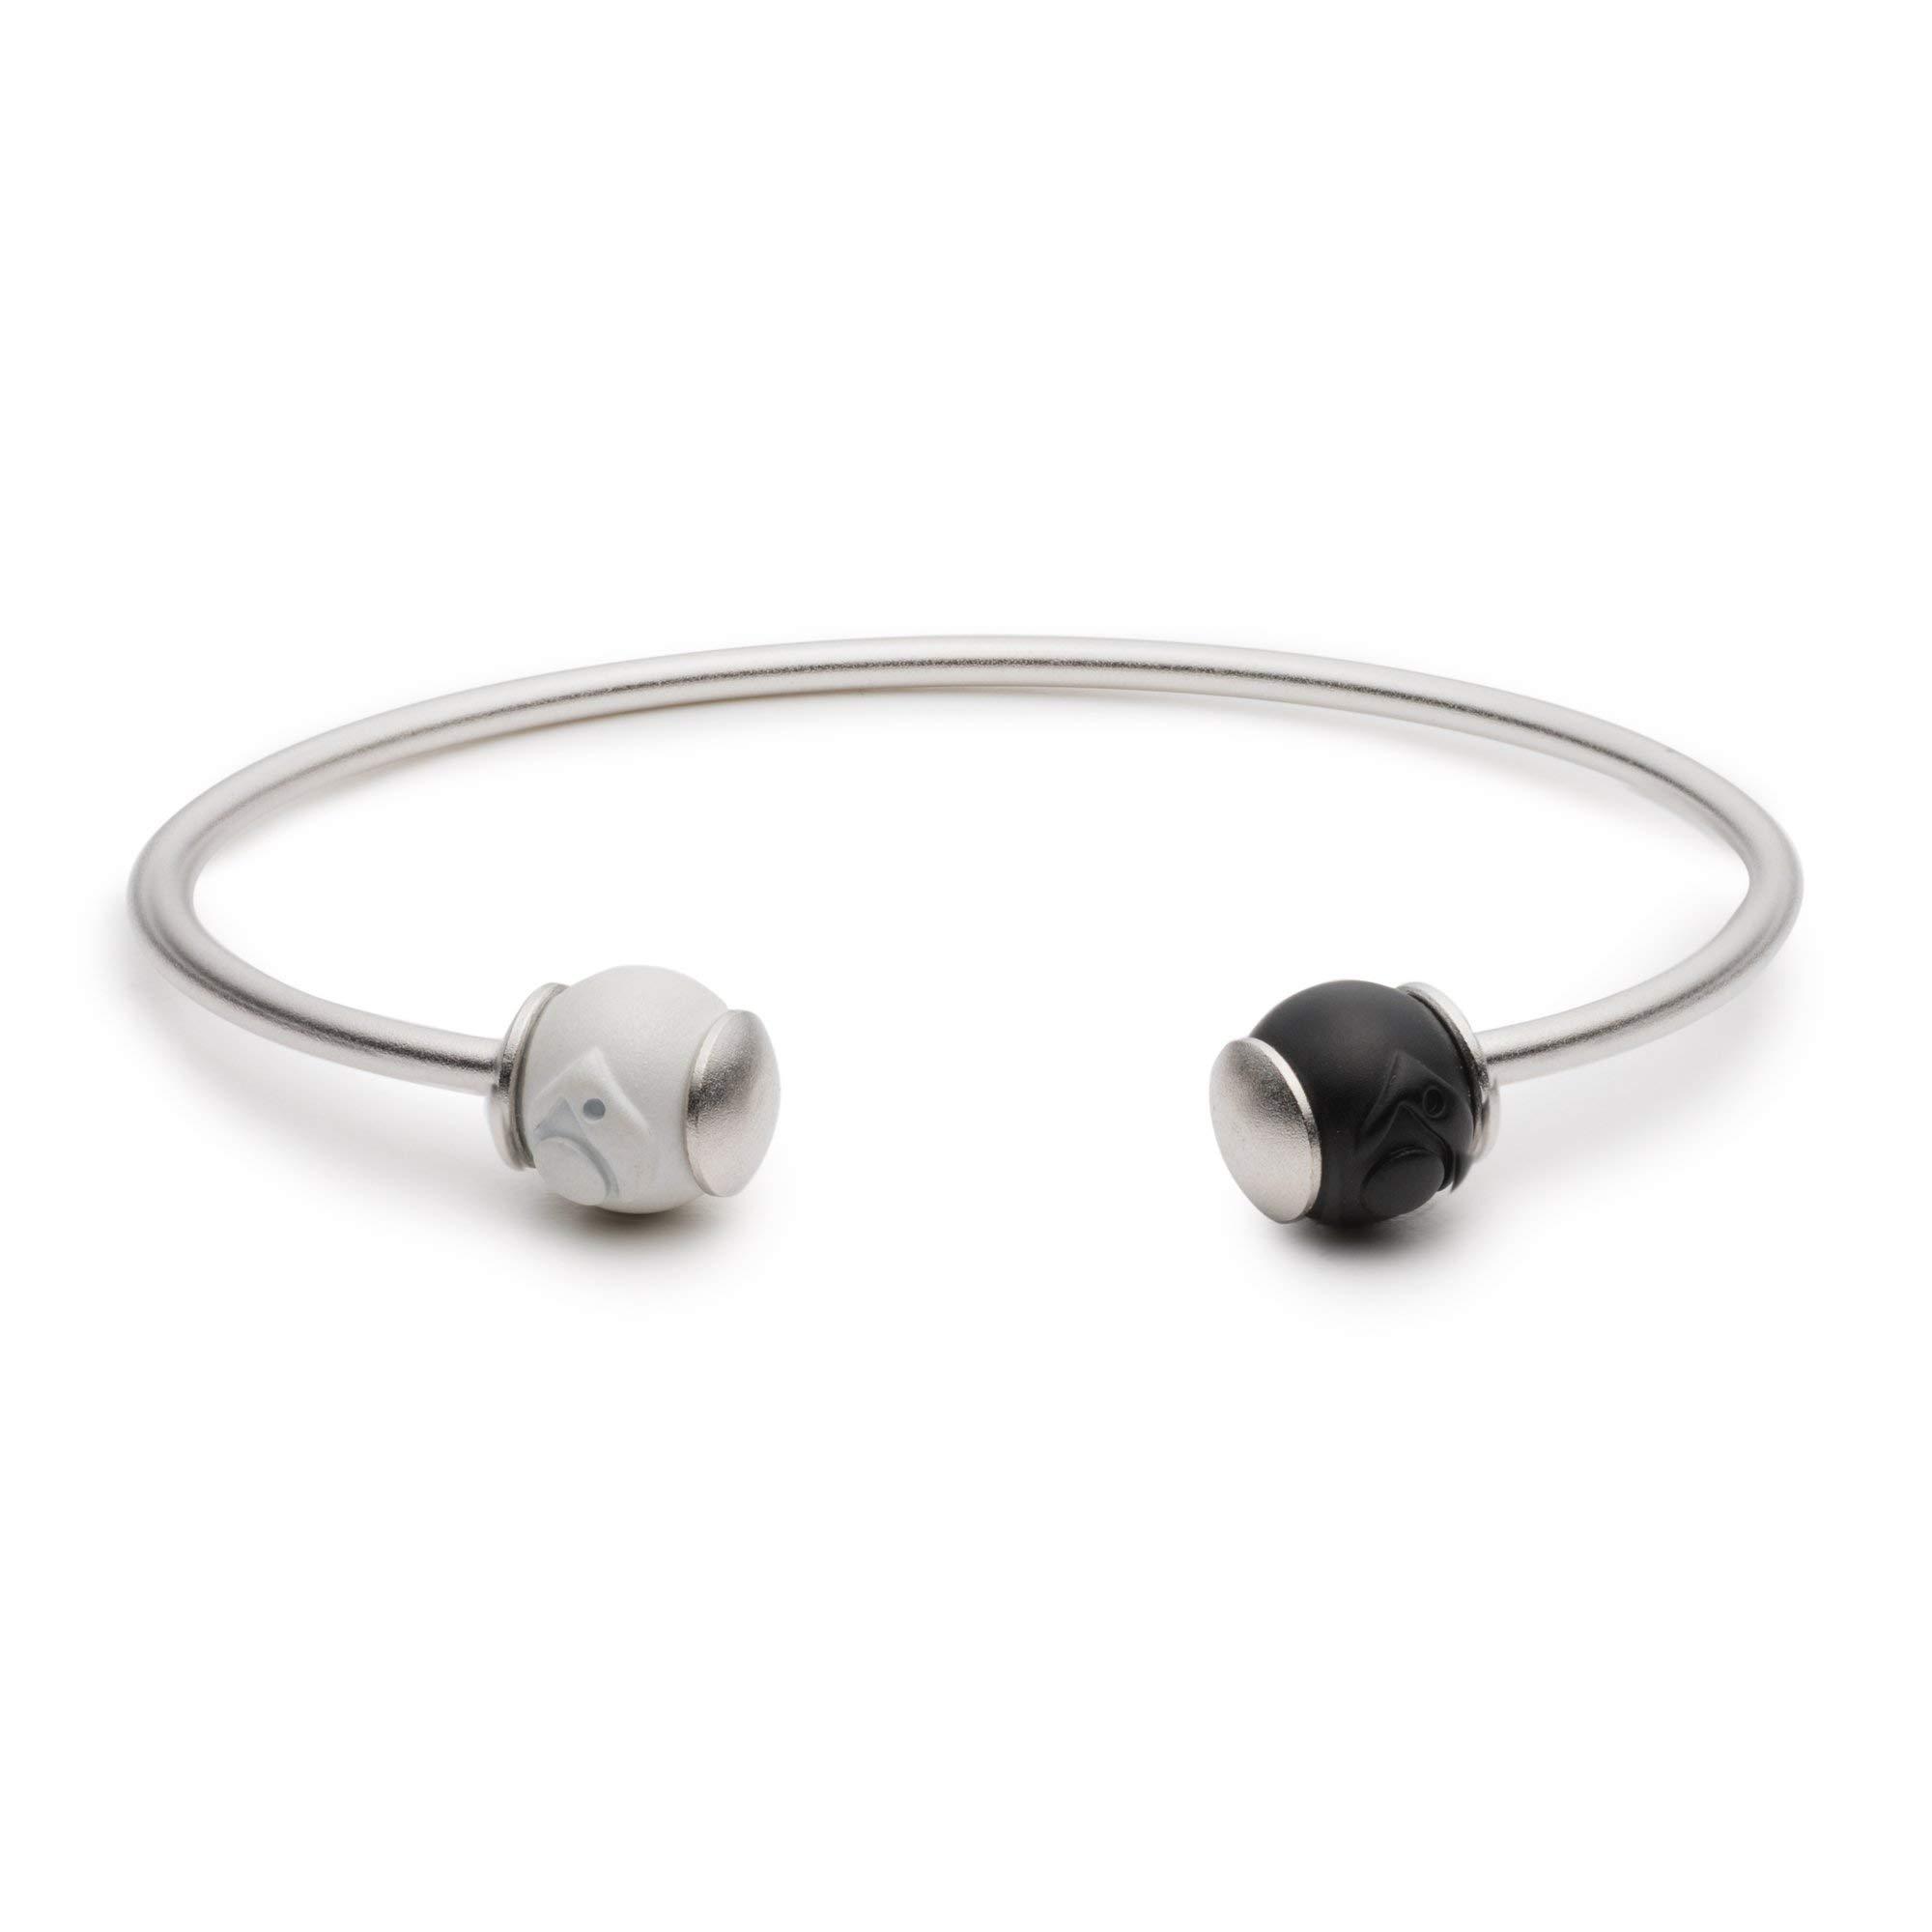 Lokai Wire Cuff Bracelet - Silver